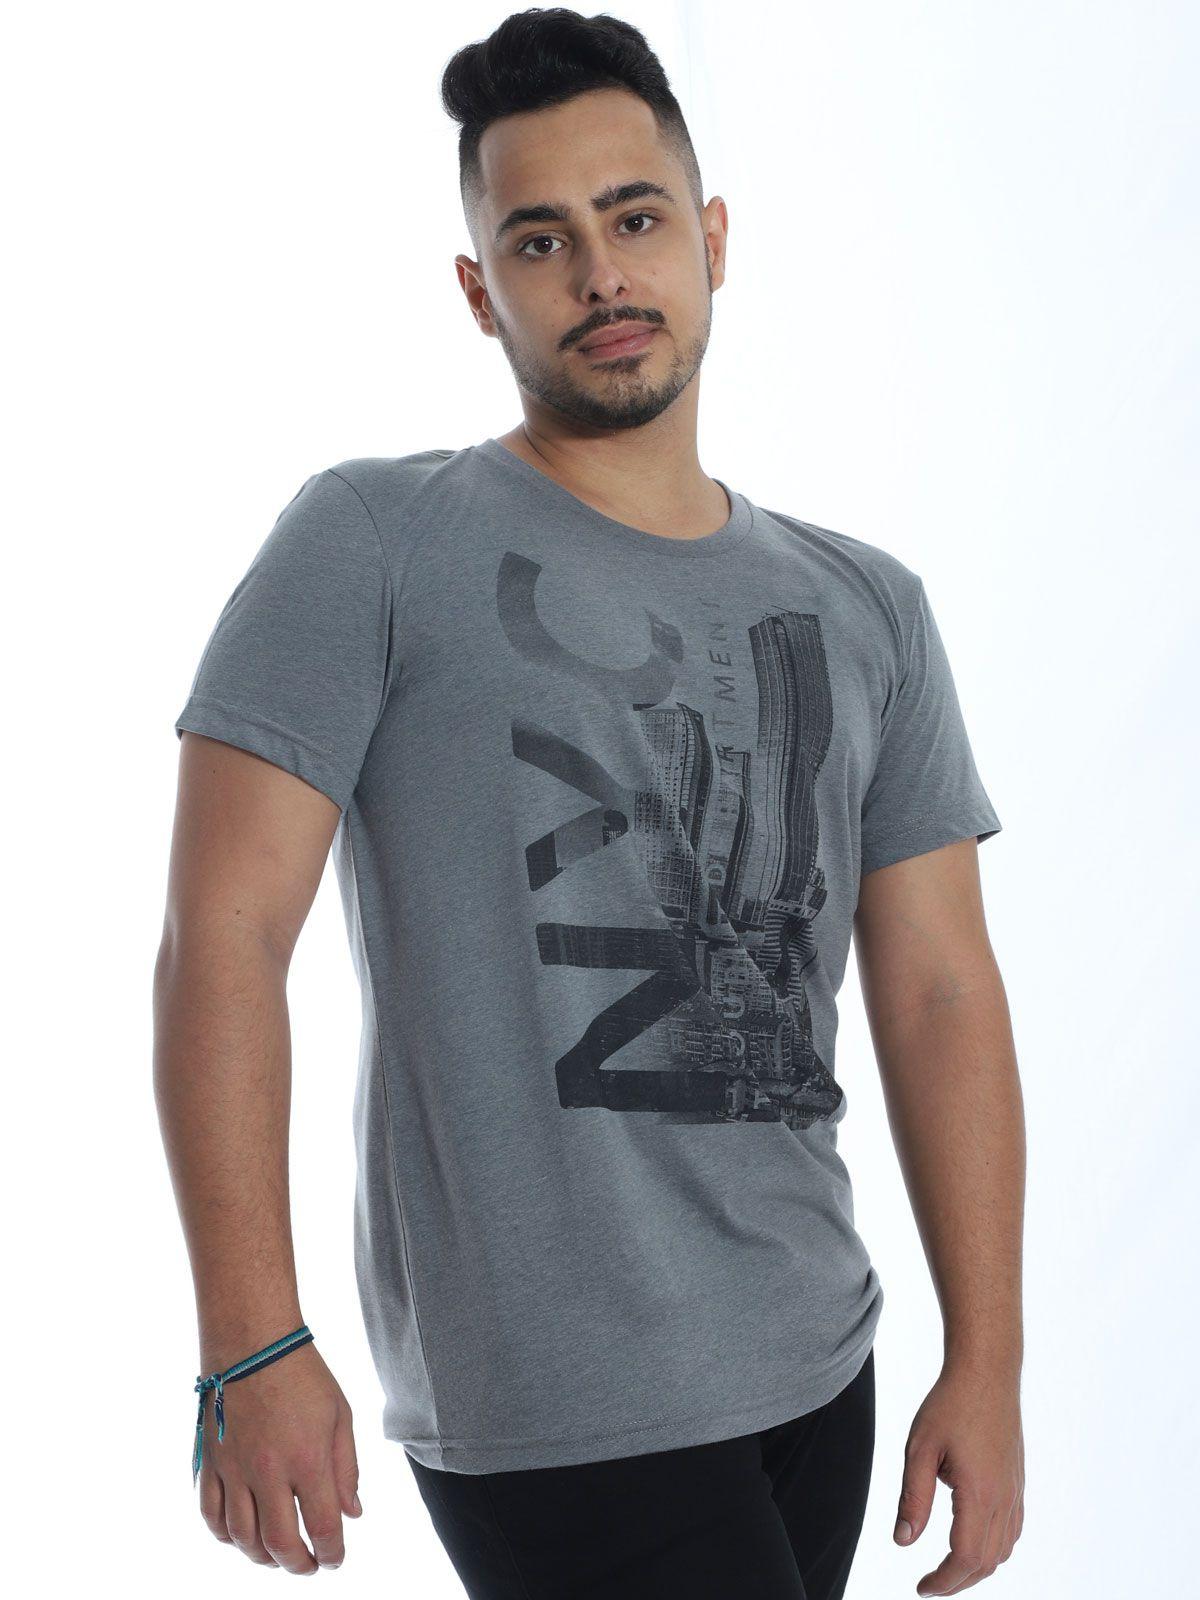 Camiseta Masculina Básica Anistia Stoned Asfalto